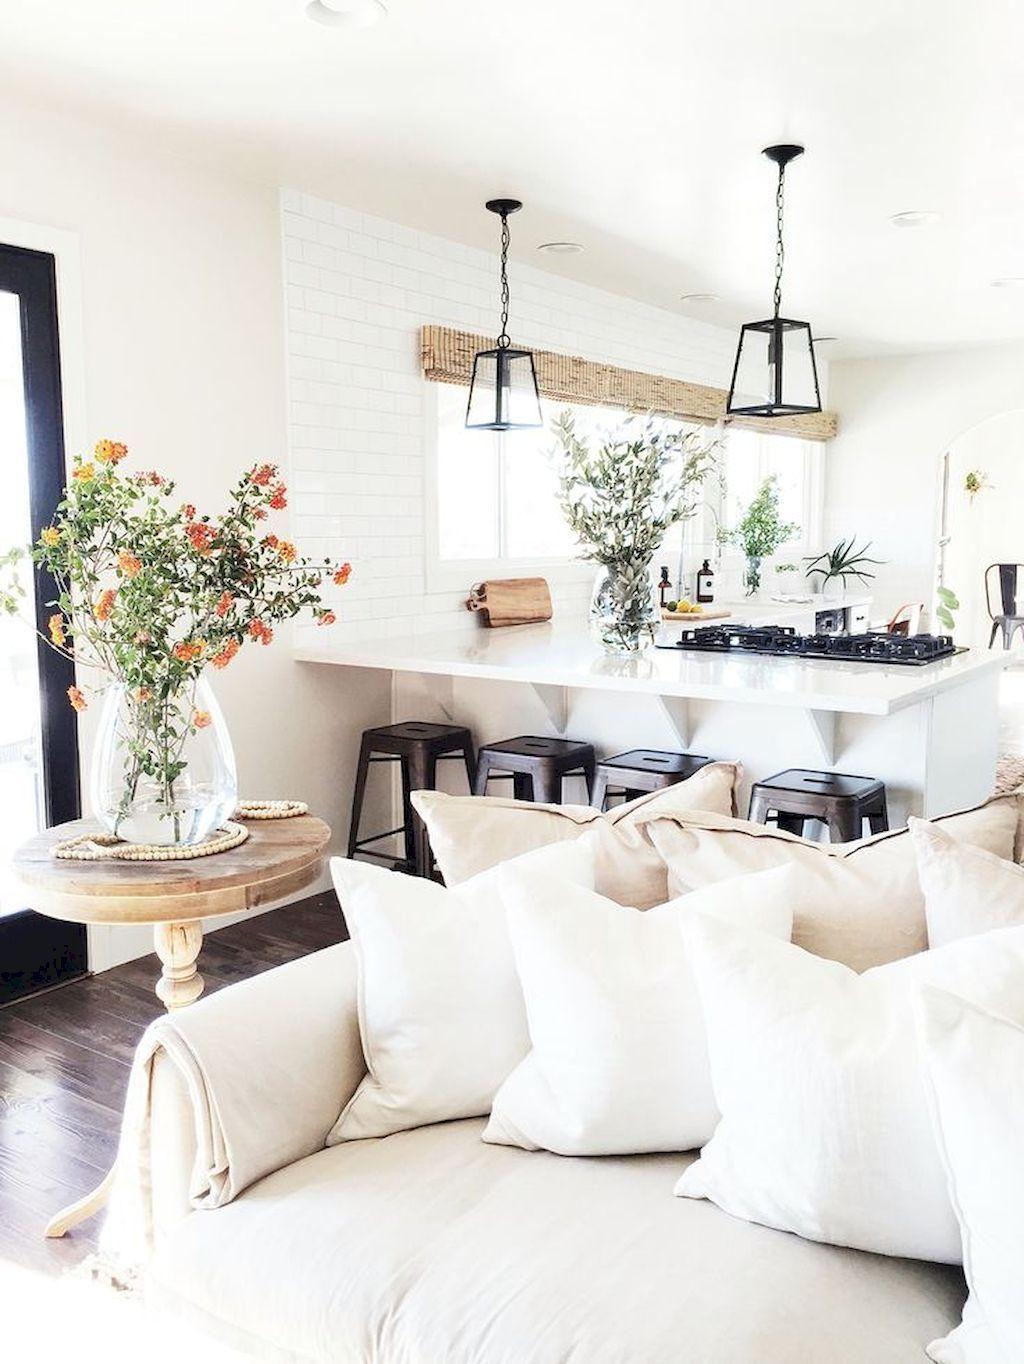 45 Beautiful Minimalist Home Decor Ideas | Pinterest | Living rooms ...